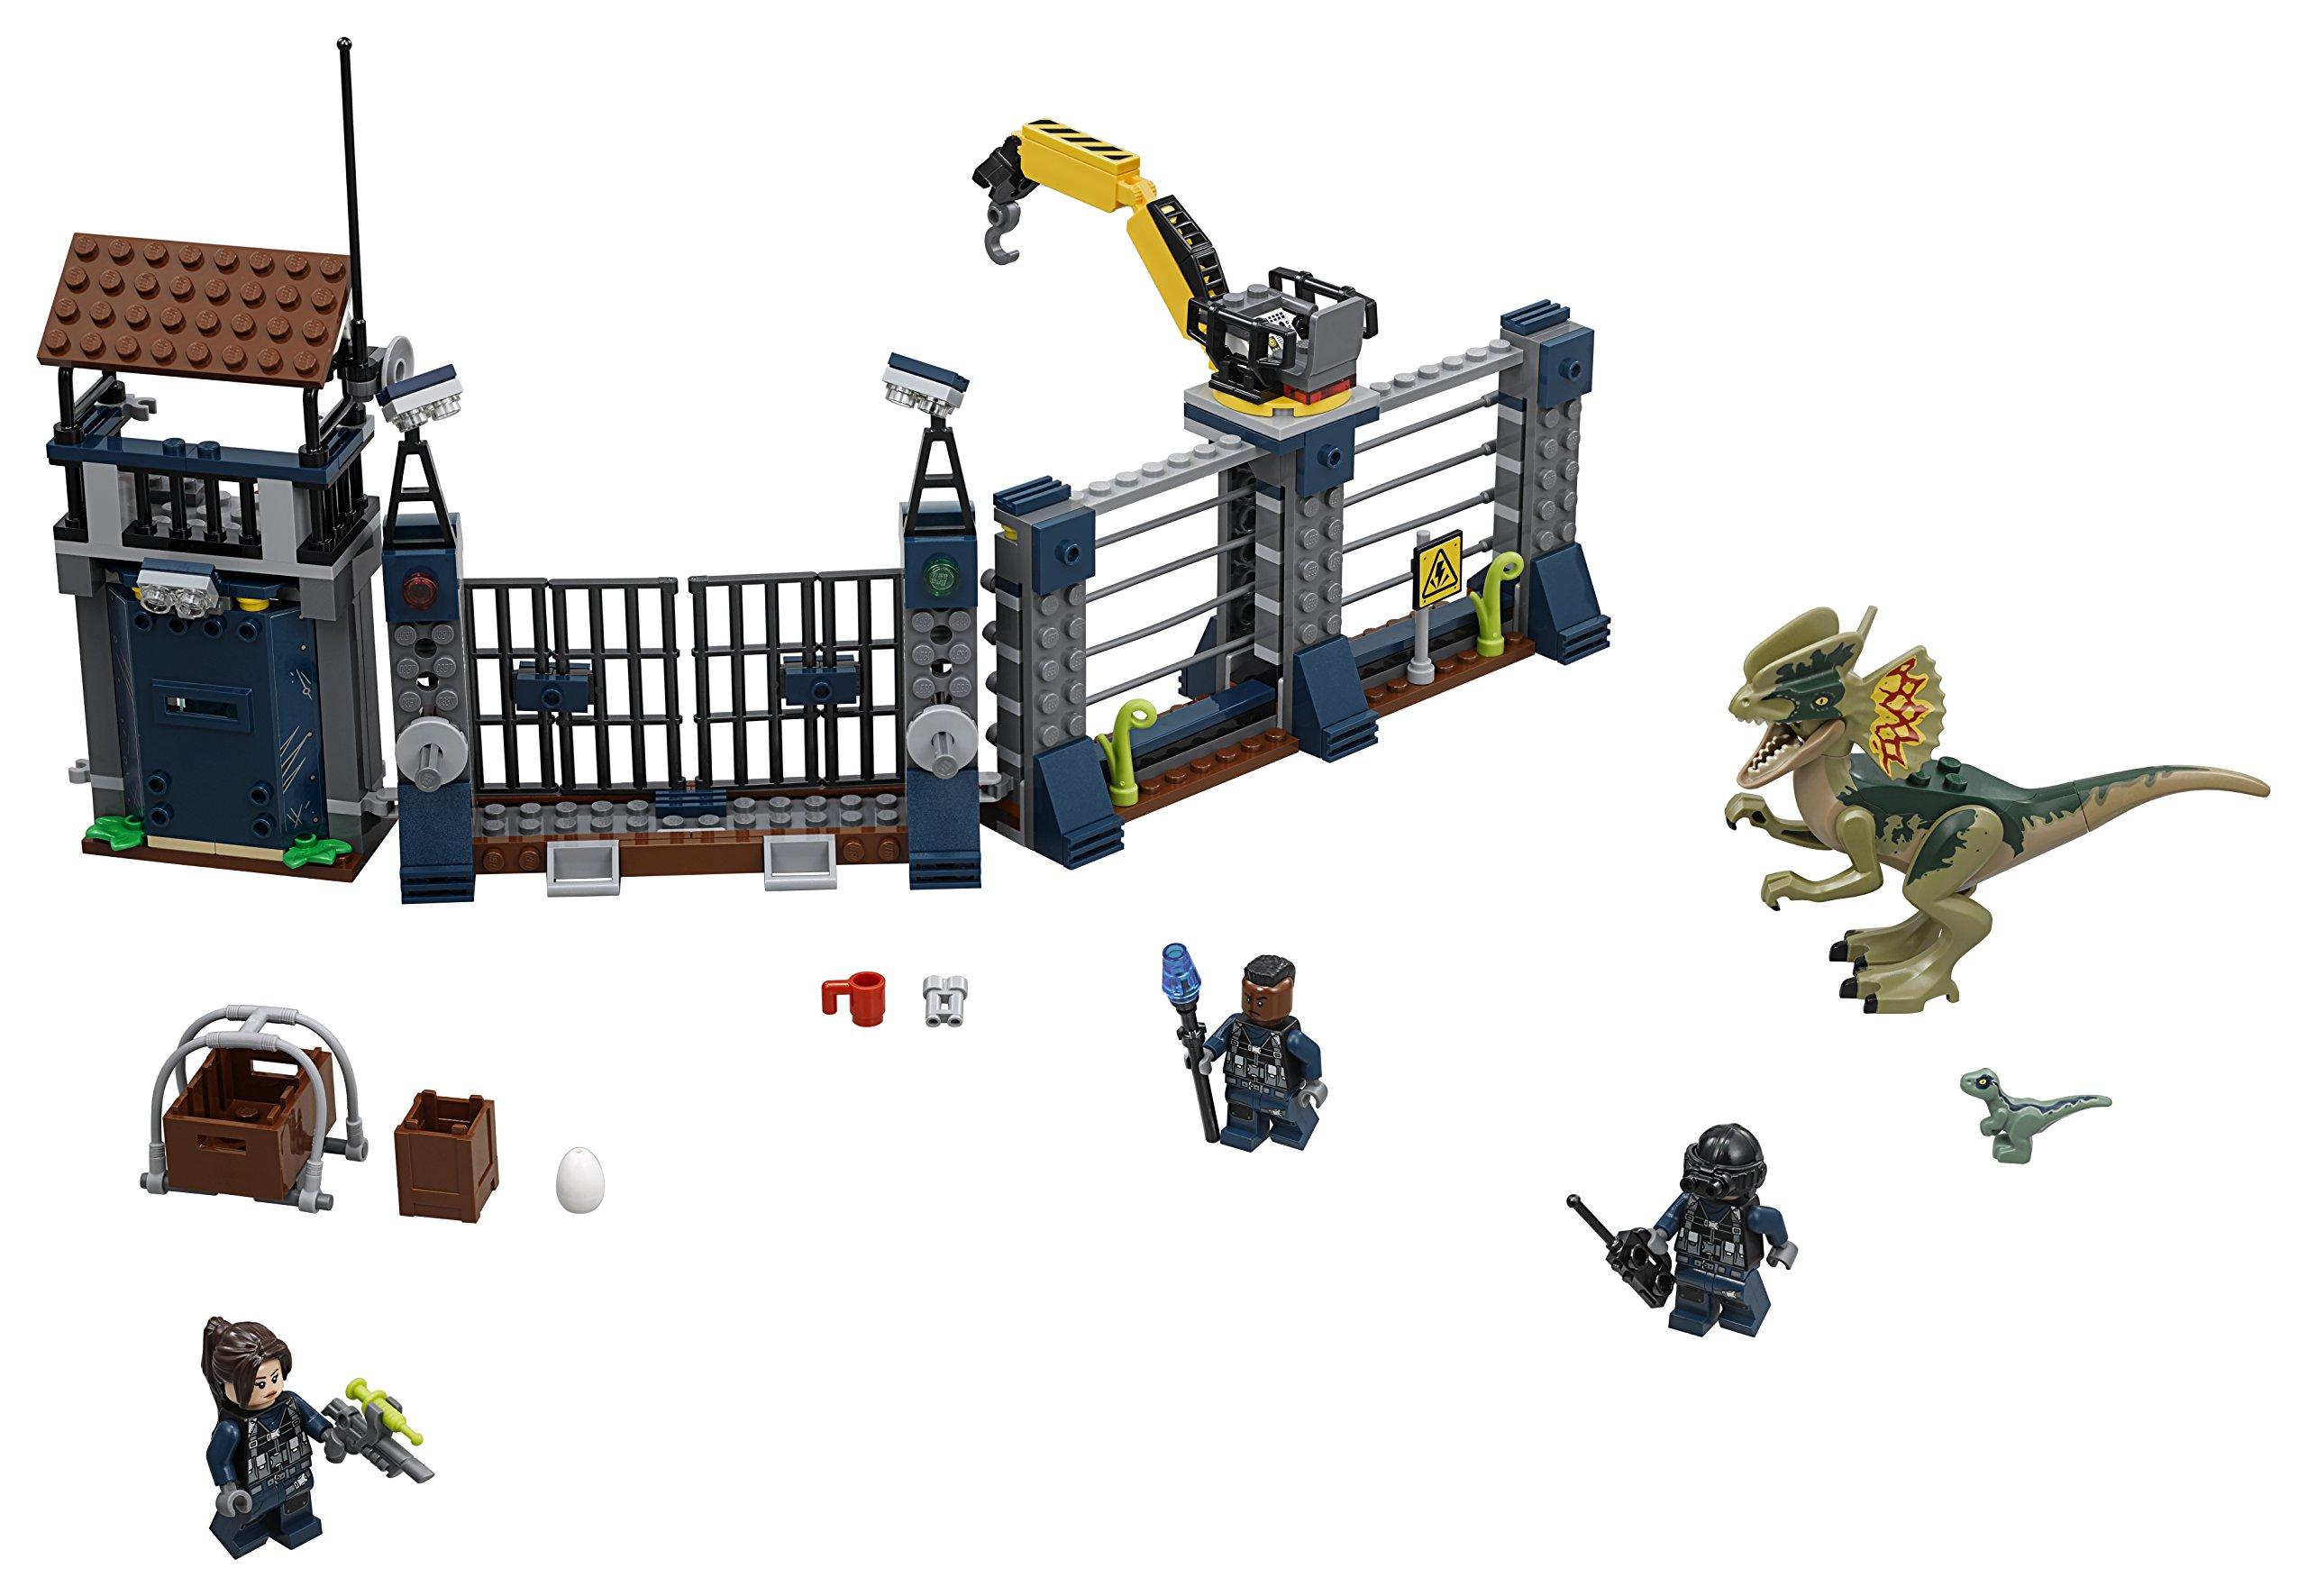 LEGO 75931 Jurassic World Dilophosaurus Outpost Attack Playset, Dinosaur Figures, Build & Play Dinosaur Toys for Kids by LEGO (Image #2)